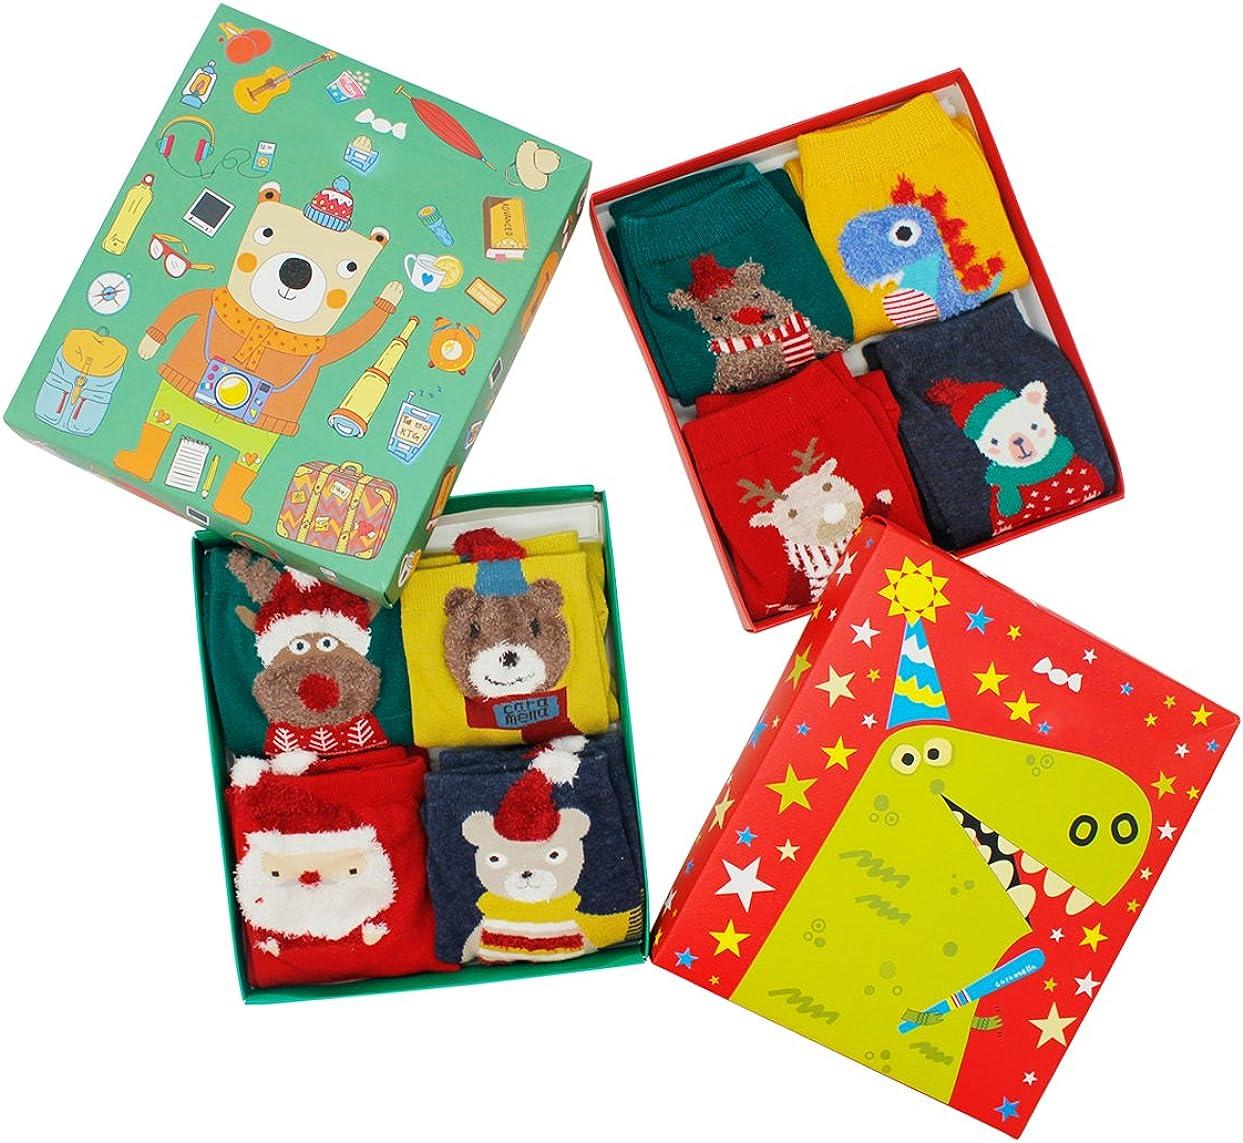 Womens Holiday Socks for Christmas Casual Animal Colorful Soft comfortable Pure Cotton Socks 8 Pairs